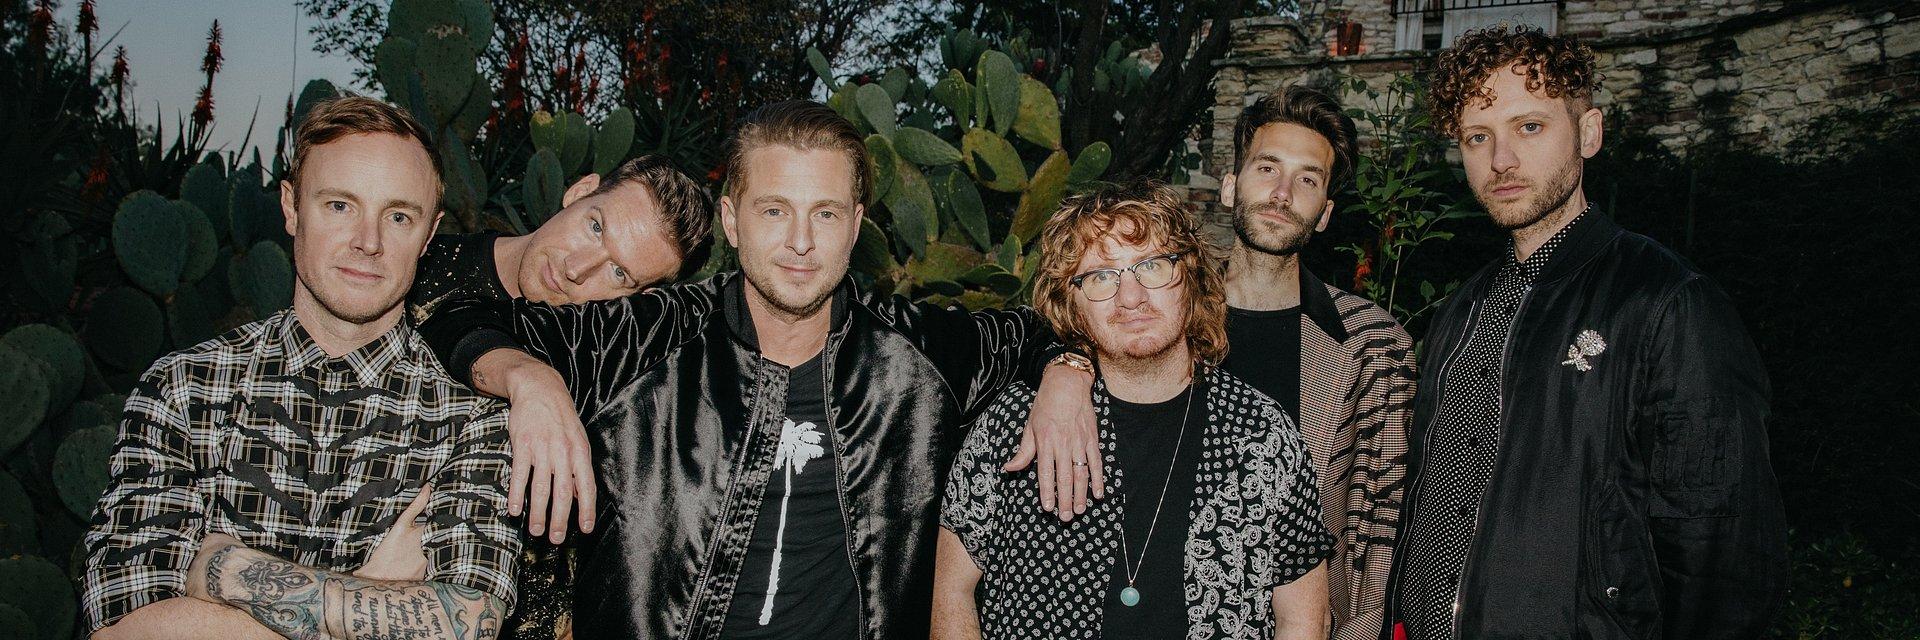 "OneRepublic z nowym singlem i klipem ""Run"""